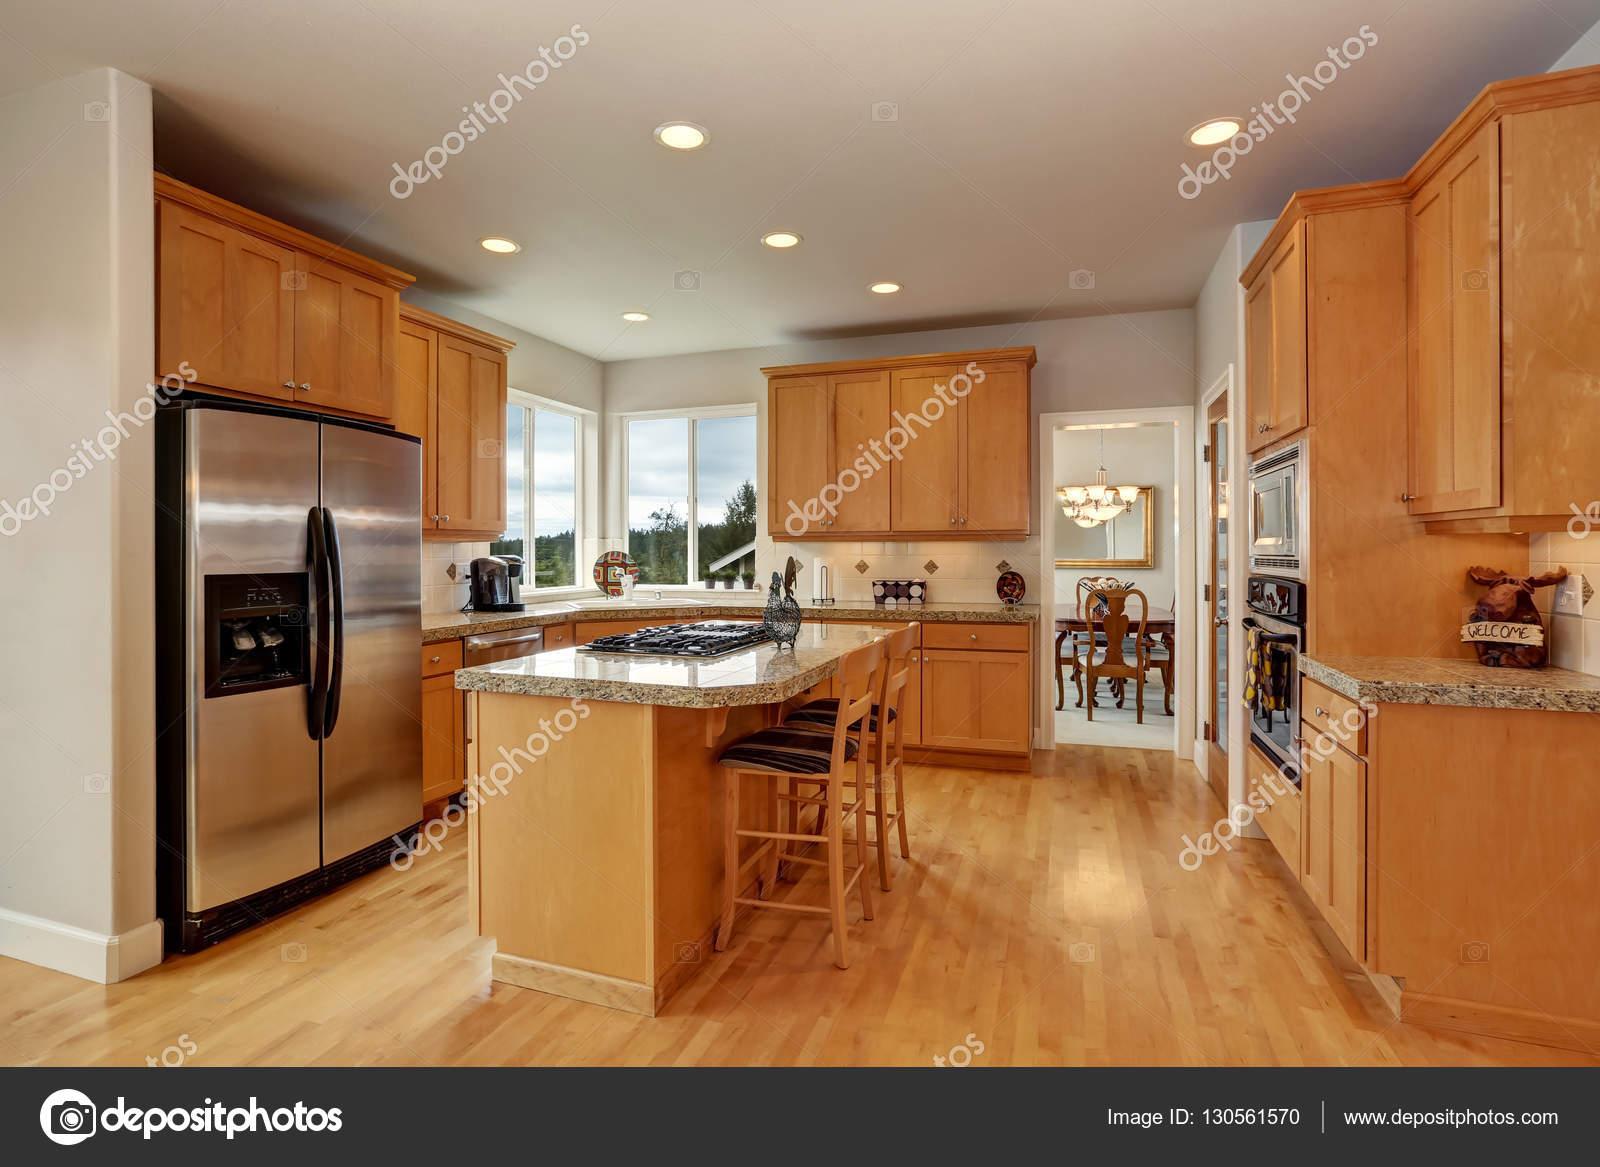 Wooden Kitchen Room Interior Design With Steel Appliances Stock Photo C Iriana88w 130561570